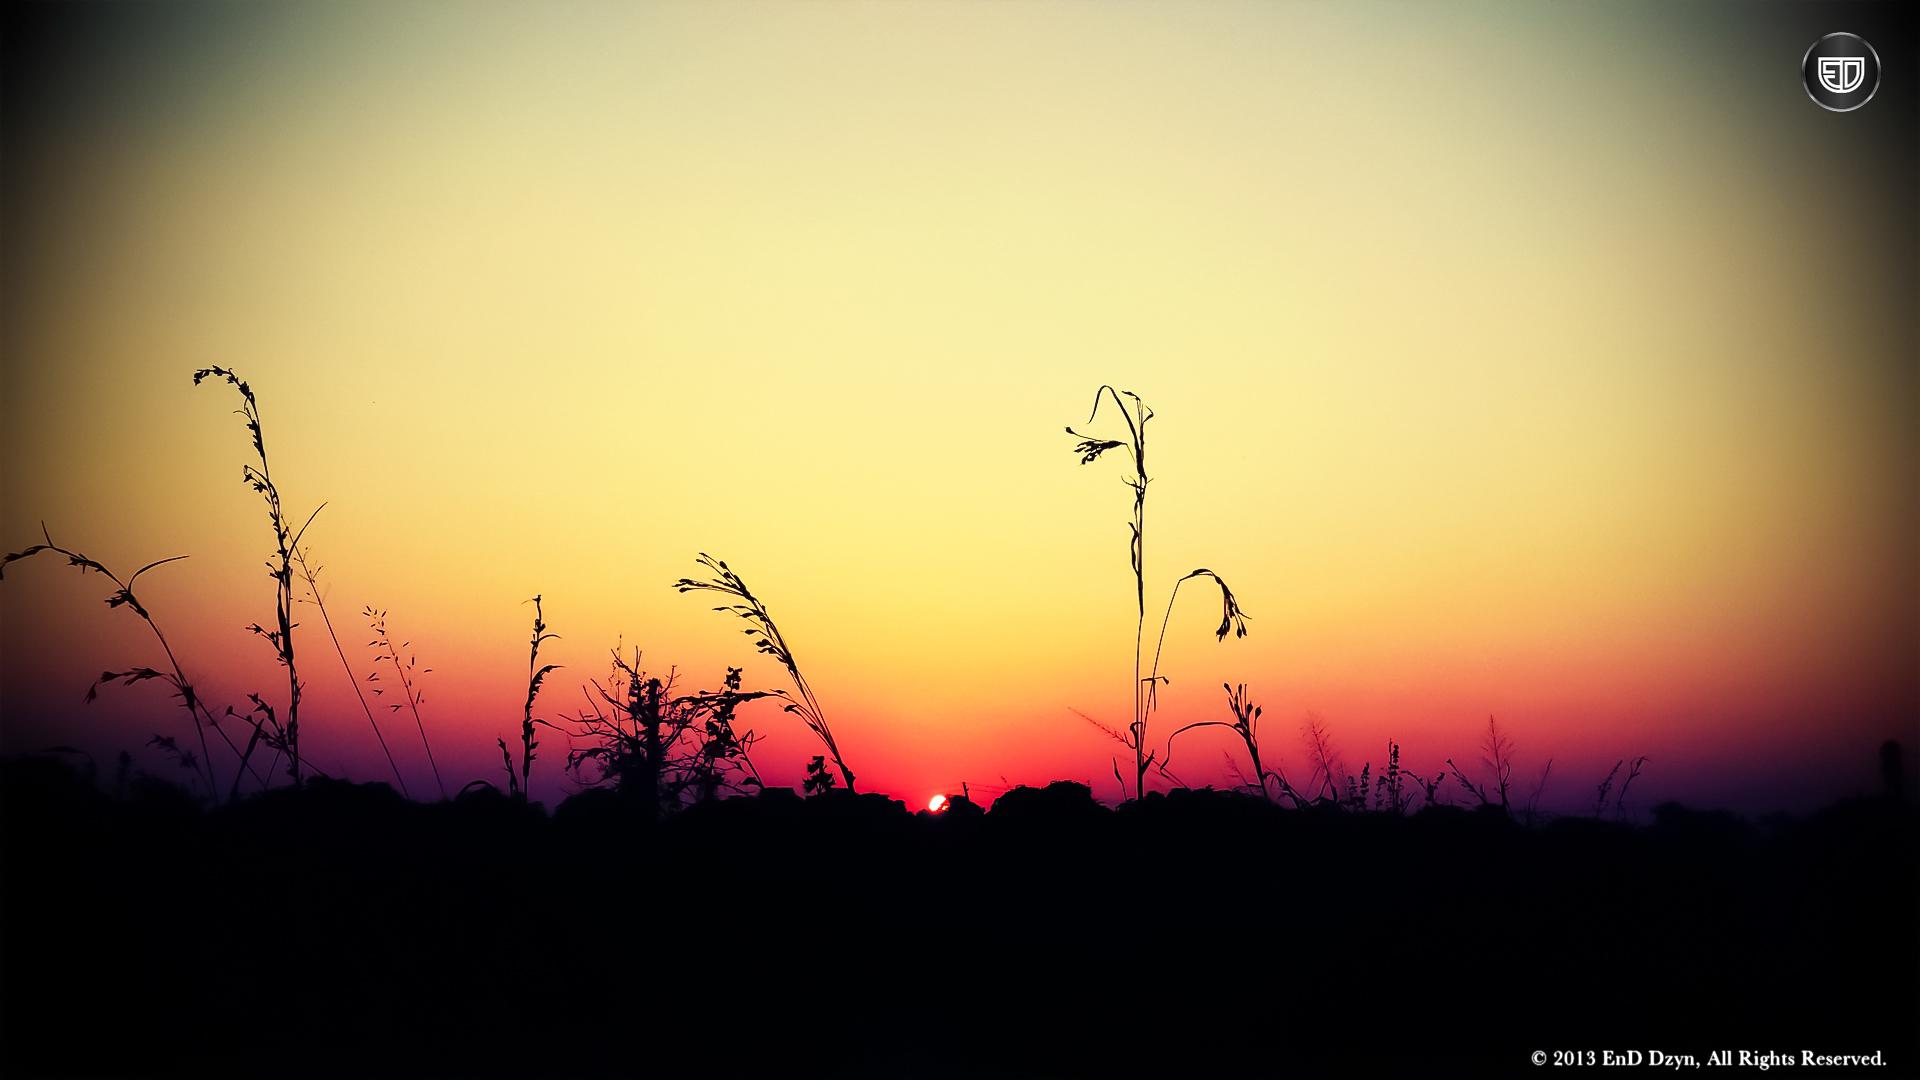 Lomography HD Wallpaper Background – Beautiful Vivid Sunset